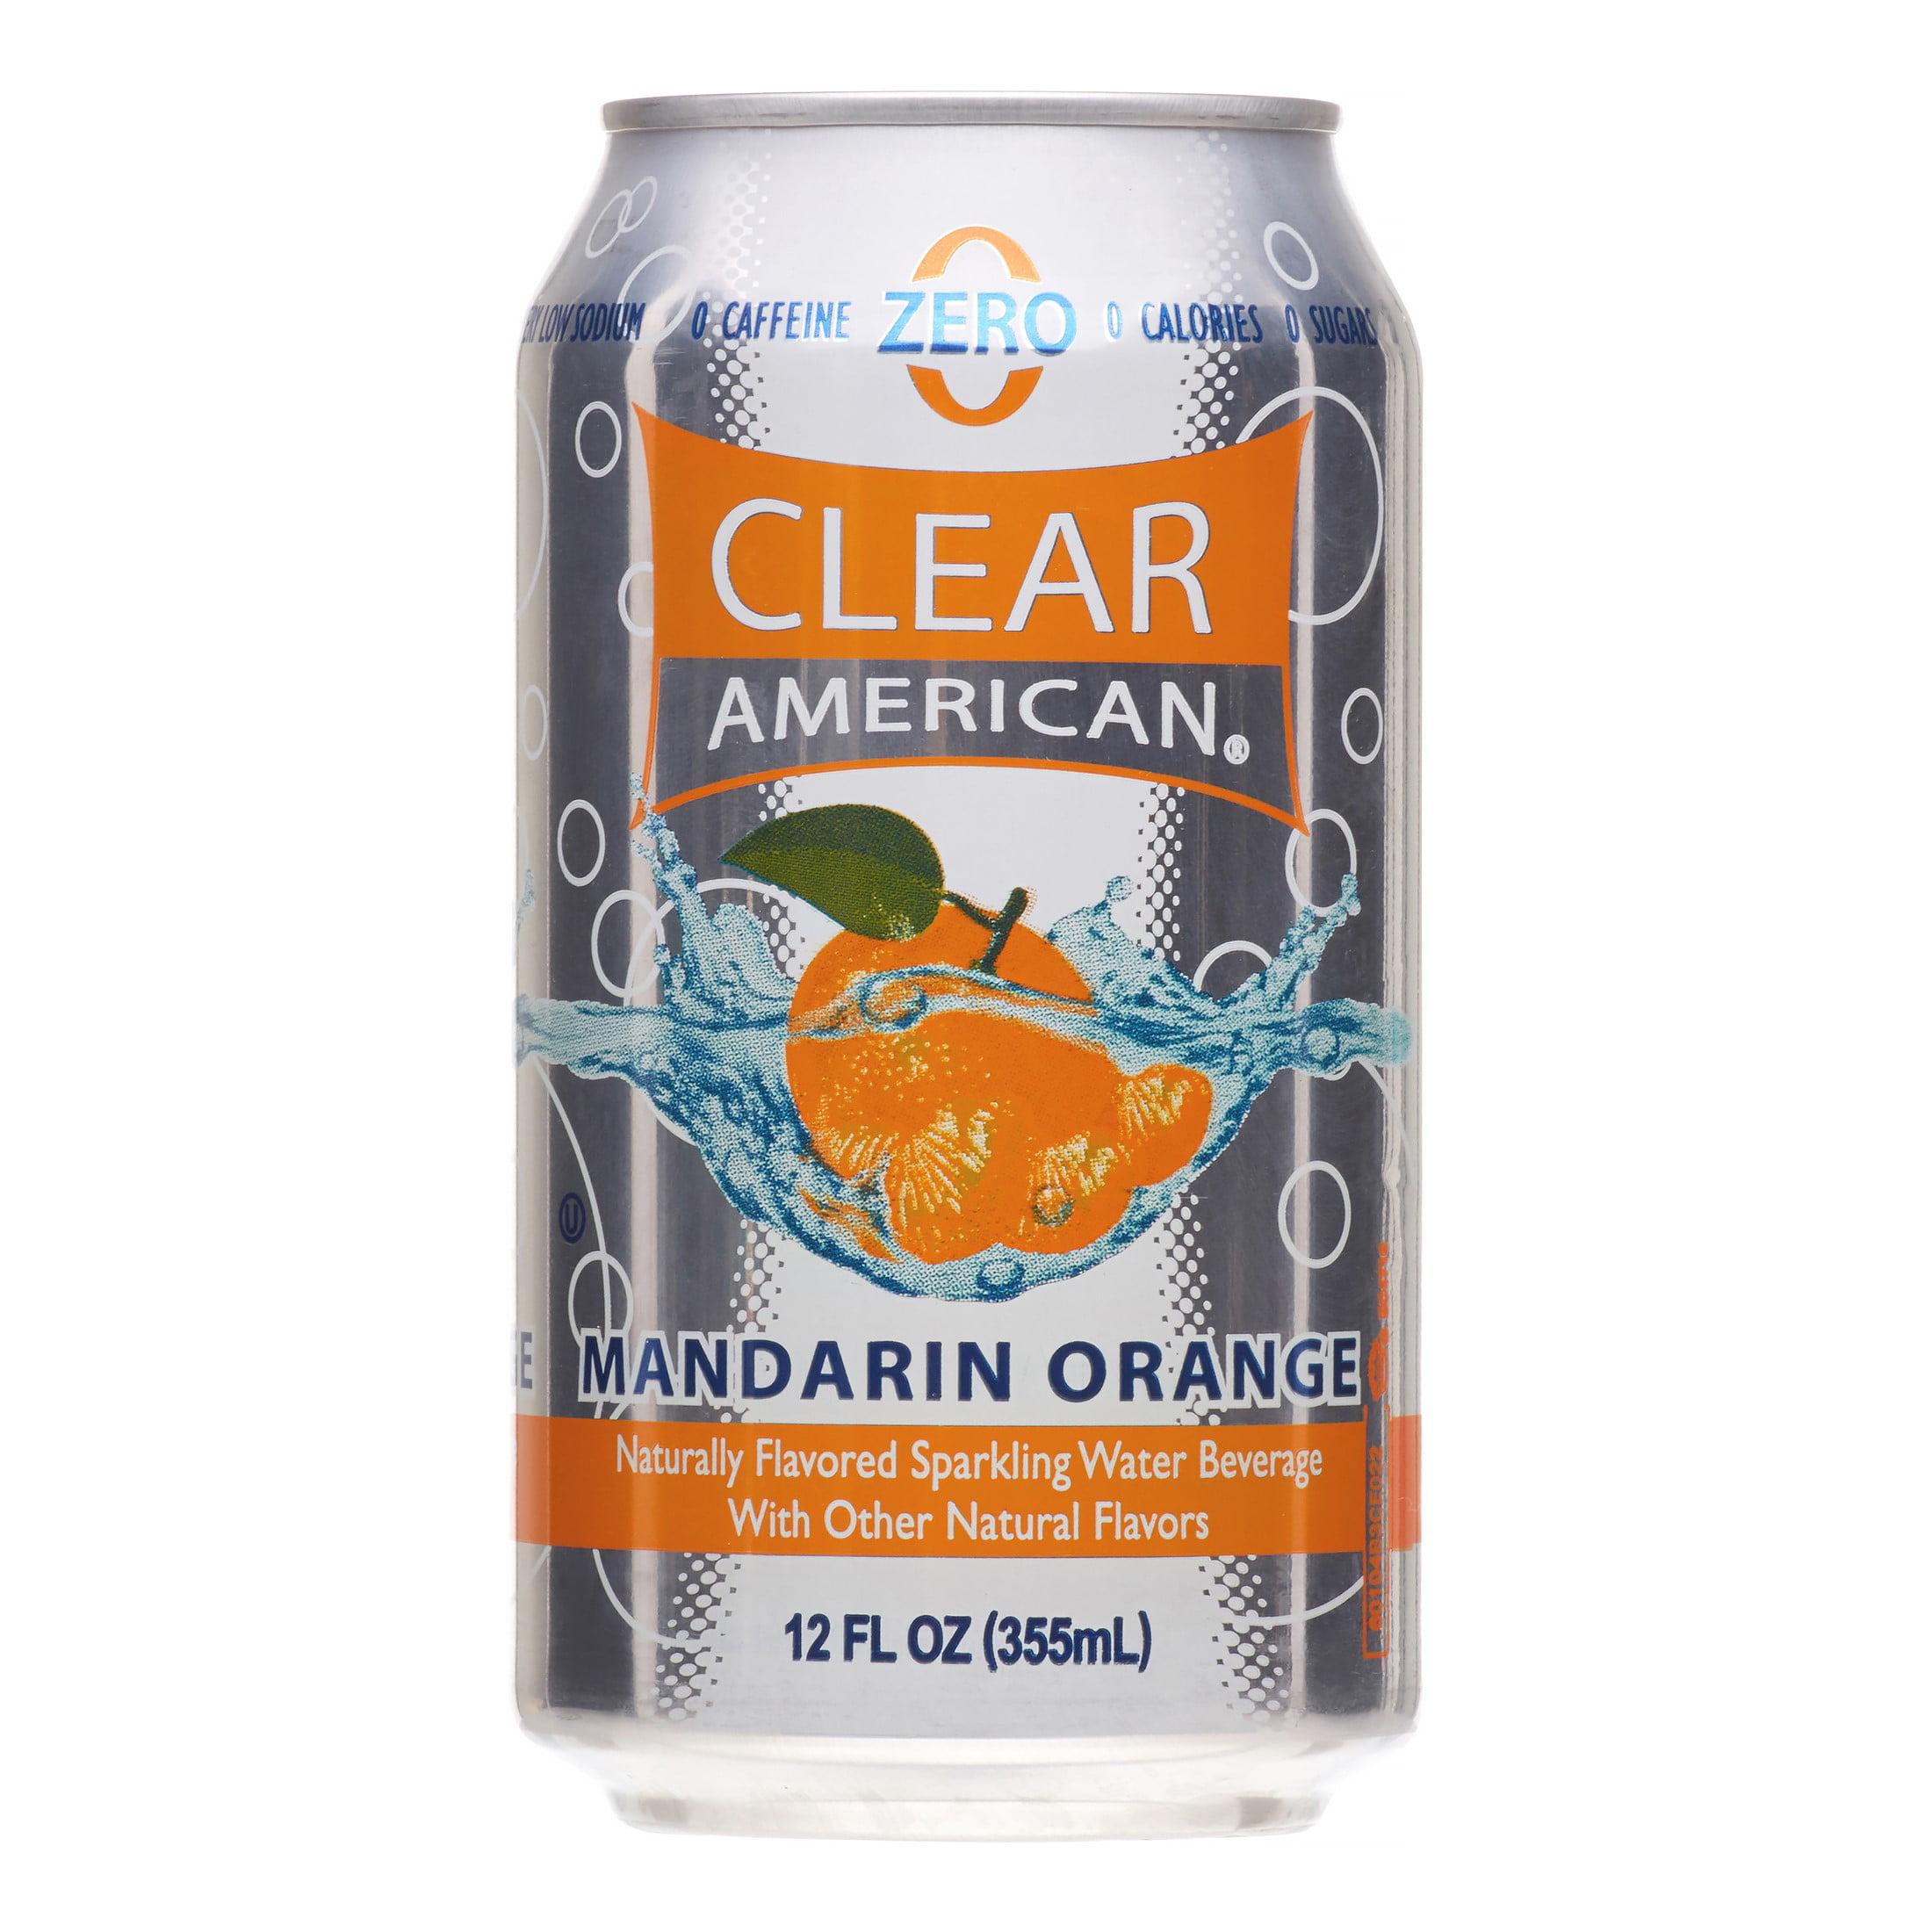 Clear American Sparkling Water, Mandarin Orange, 12 Fl Oz, 12 Count